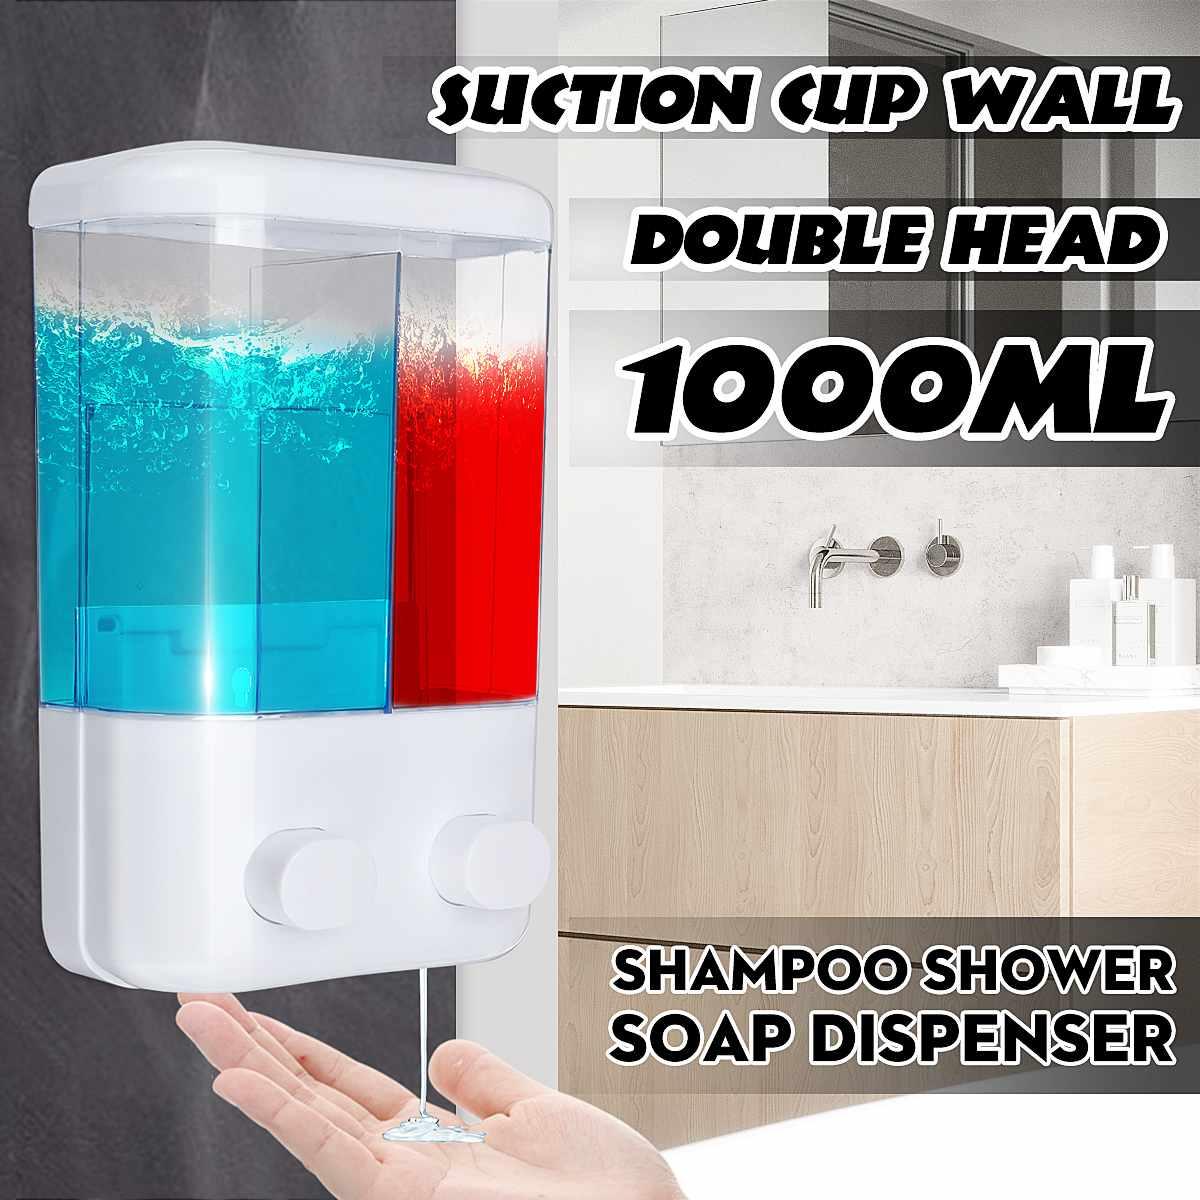 1000ml Wall-Mount Soap Dispenser Shower Liquid Soap Shampoo Dispenser For Kitchen Bathroom Hotel Suction Cup Accessoires